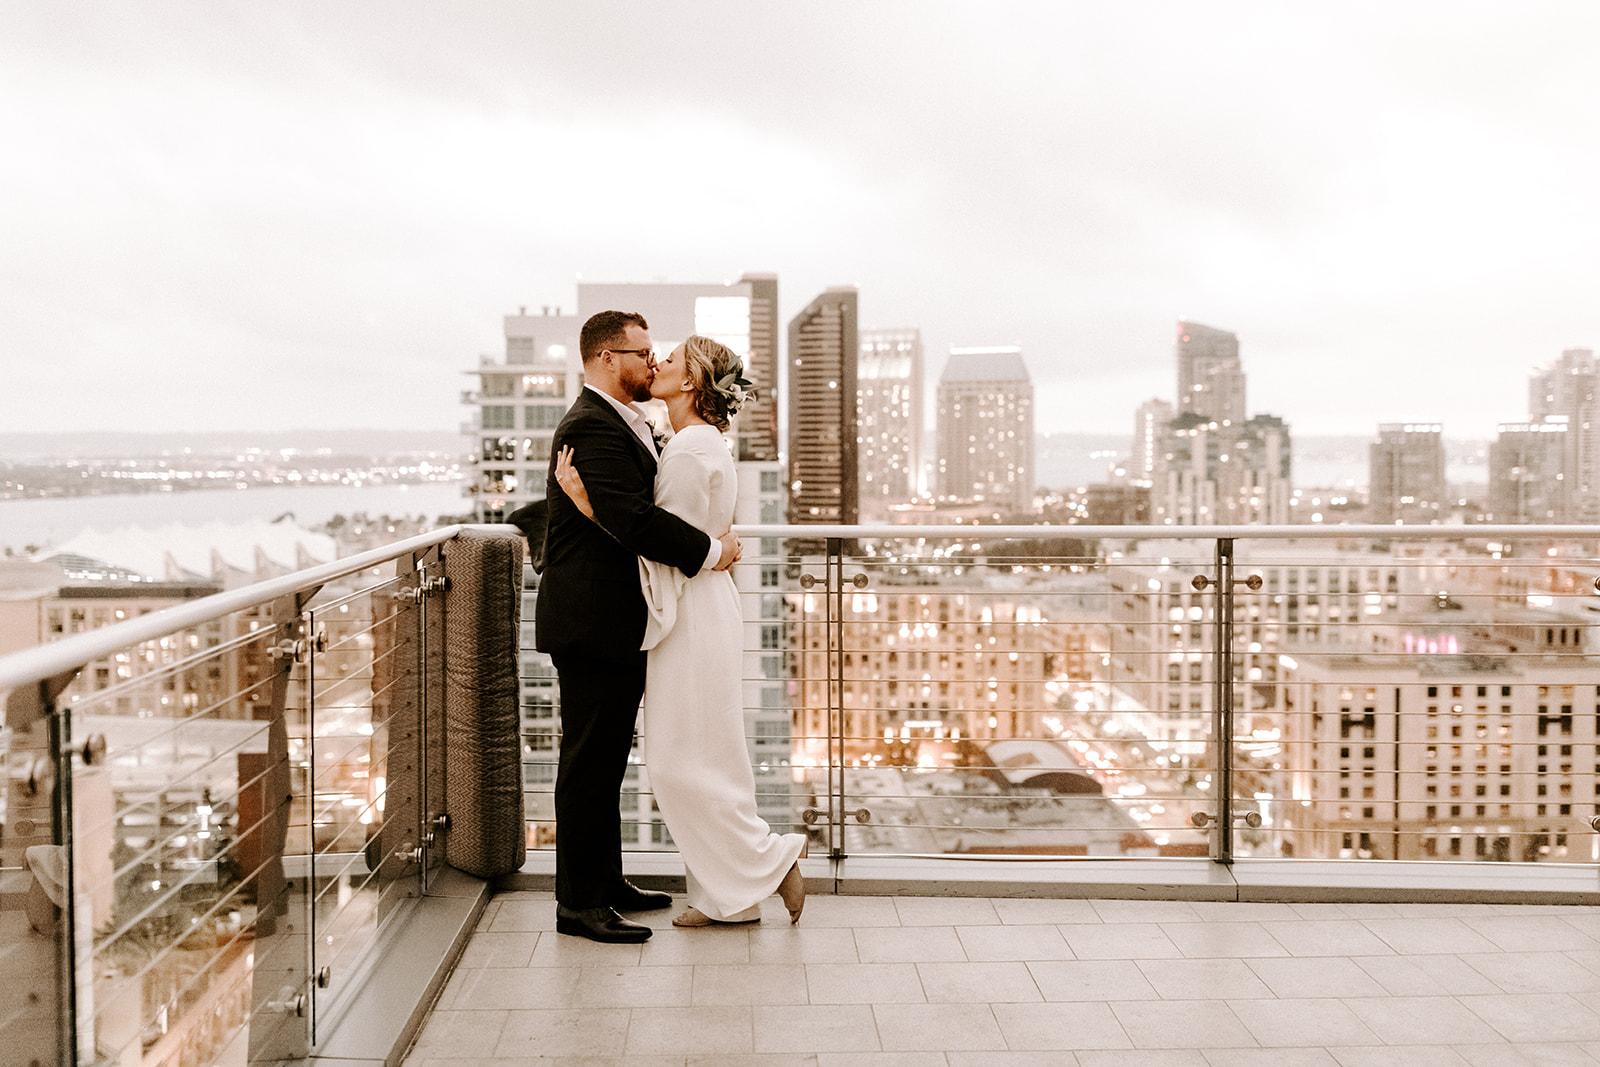 Mckenzie + Trevor The Ultimate Skybox Downtown San Diego Wedding Ellie Cole Photographer-695-2.jpg